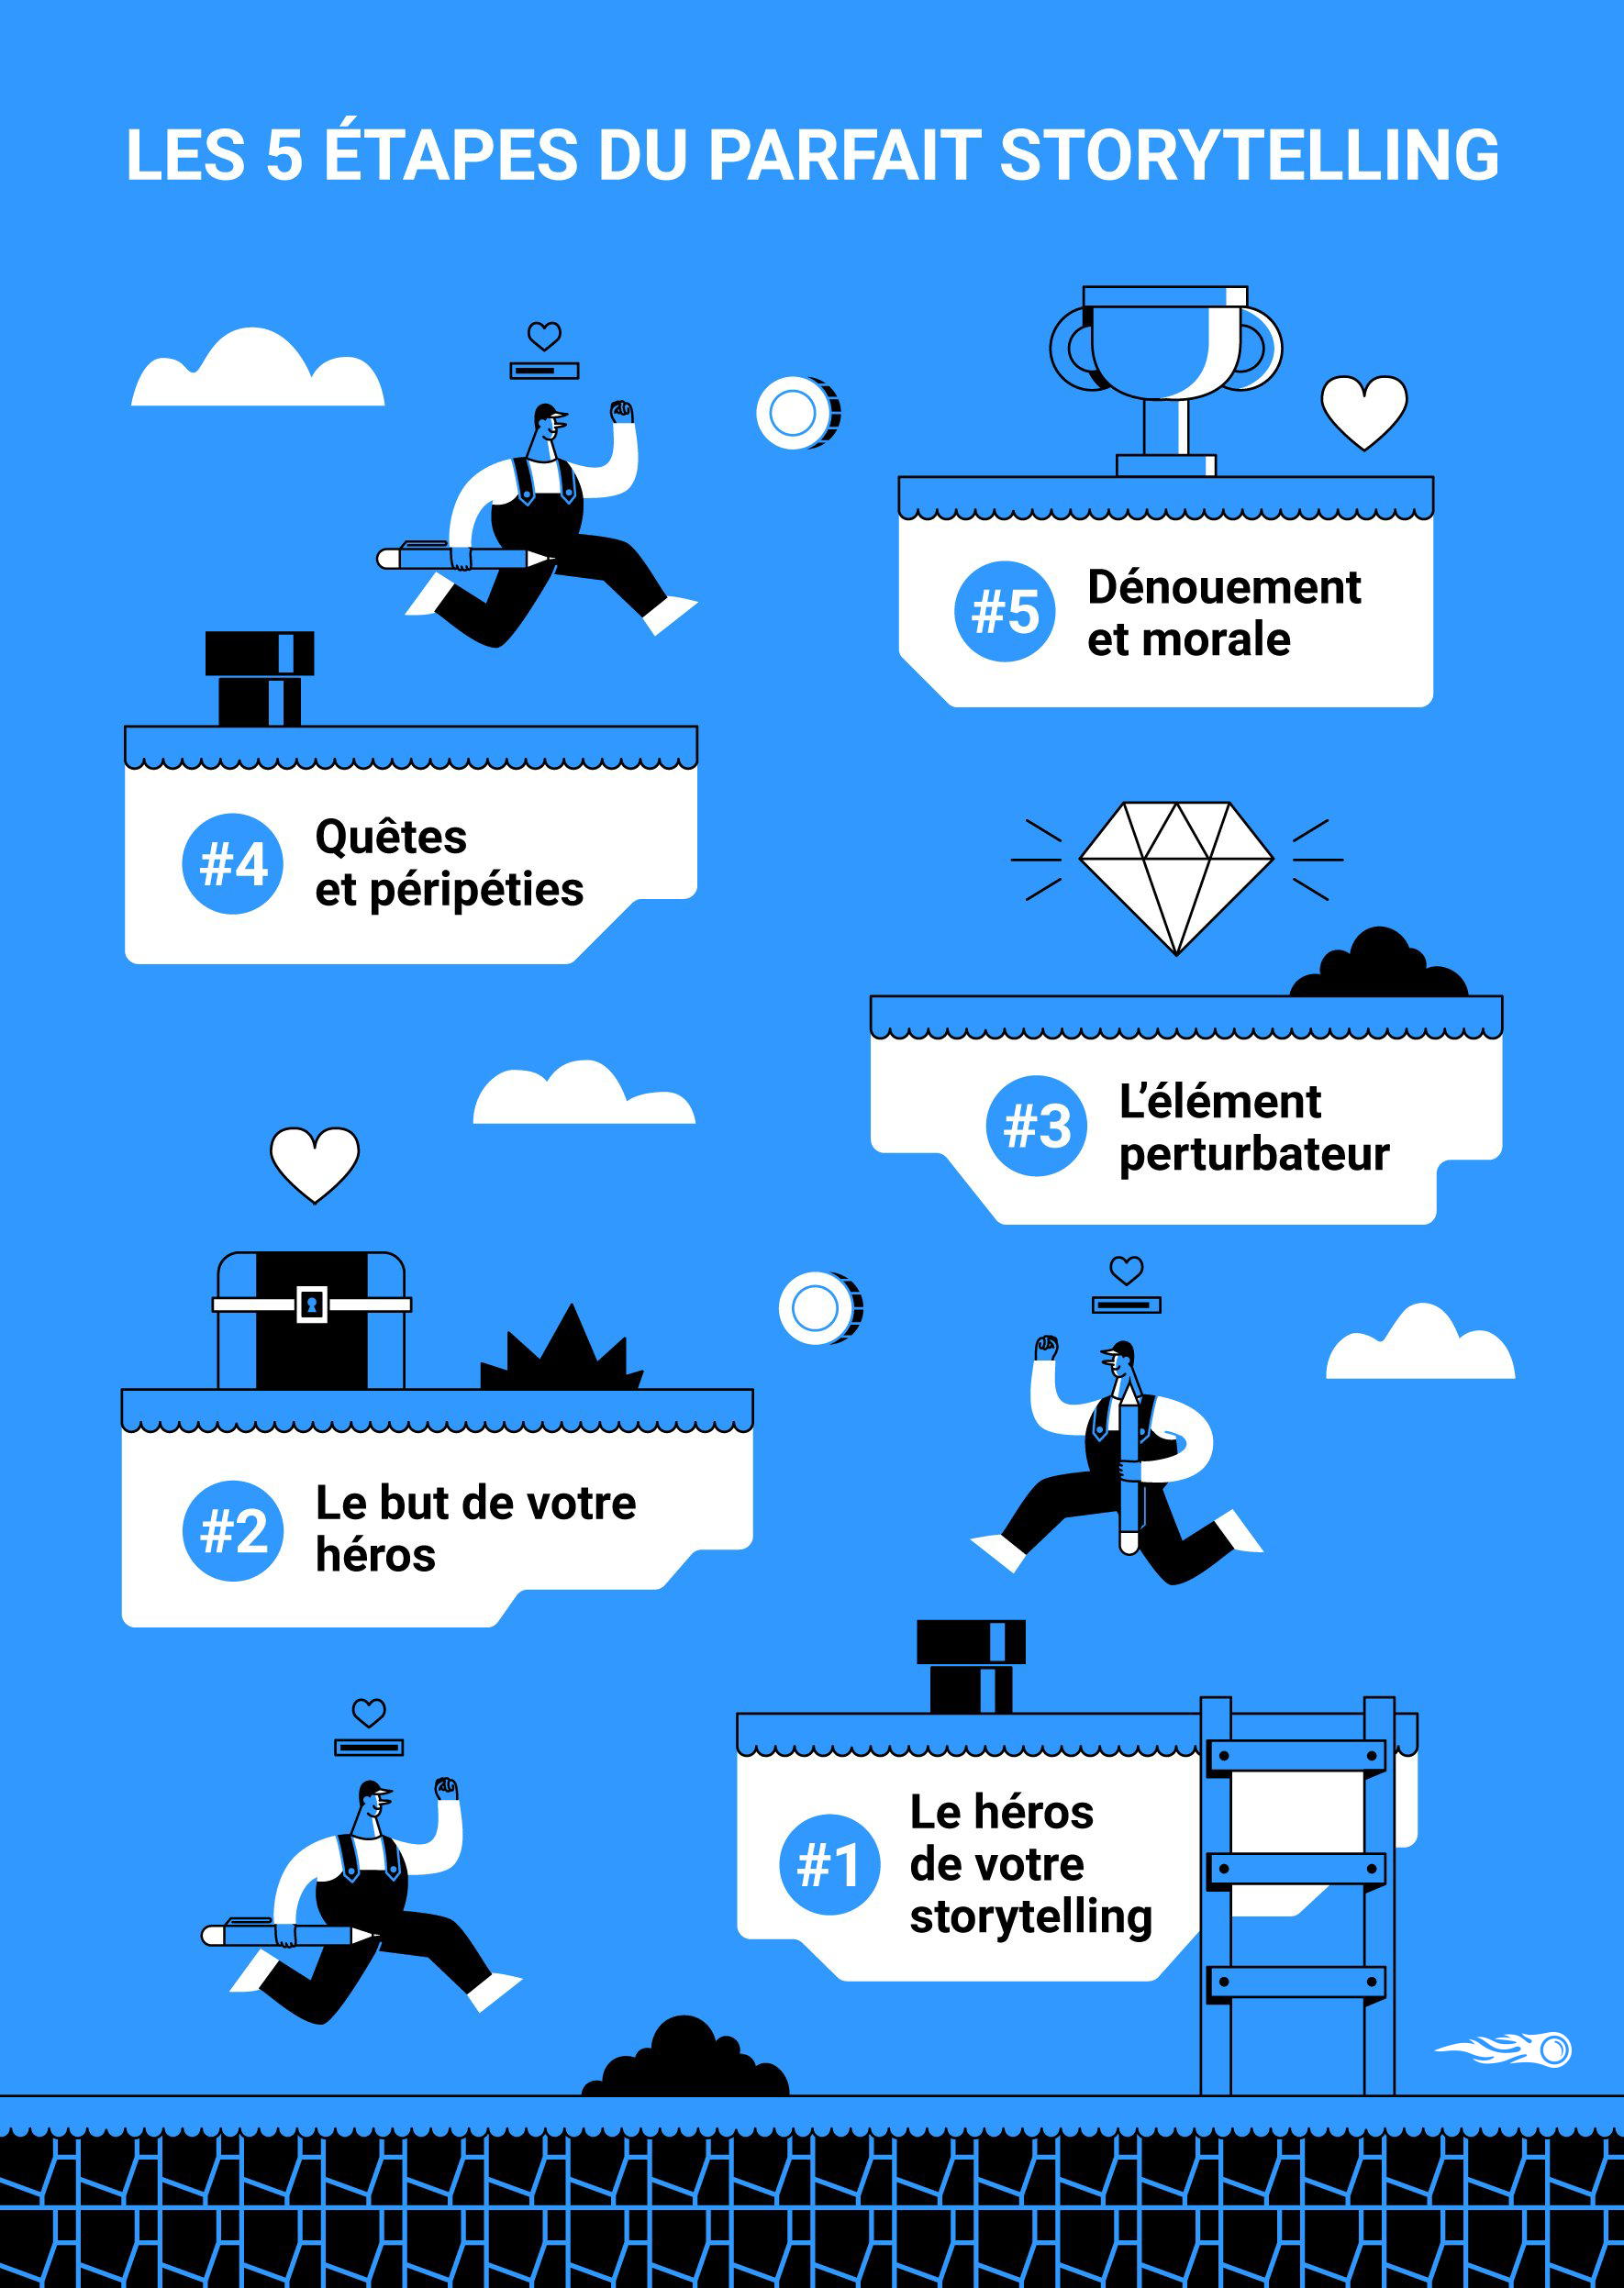 Les 5 étapes d'un bon storytelling - SEMrush